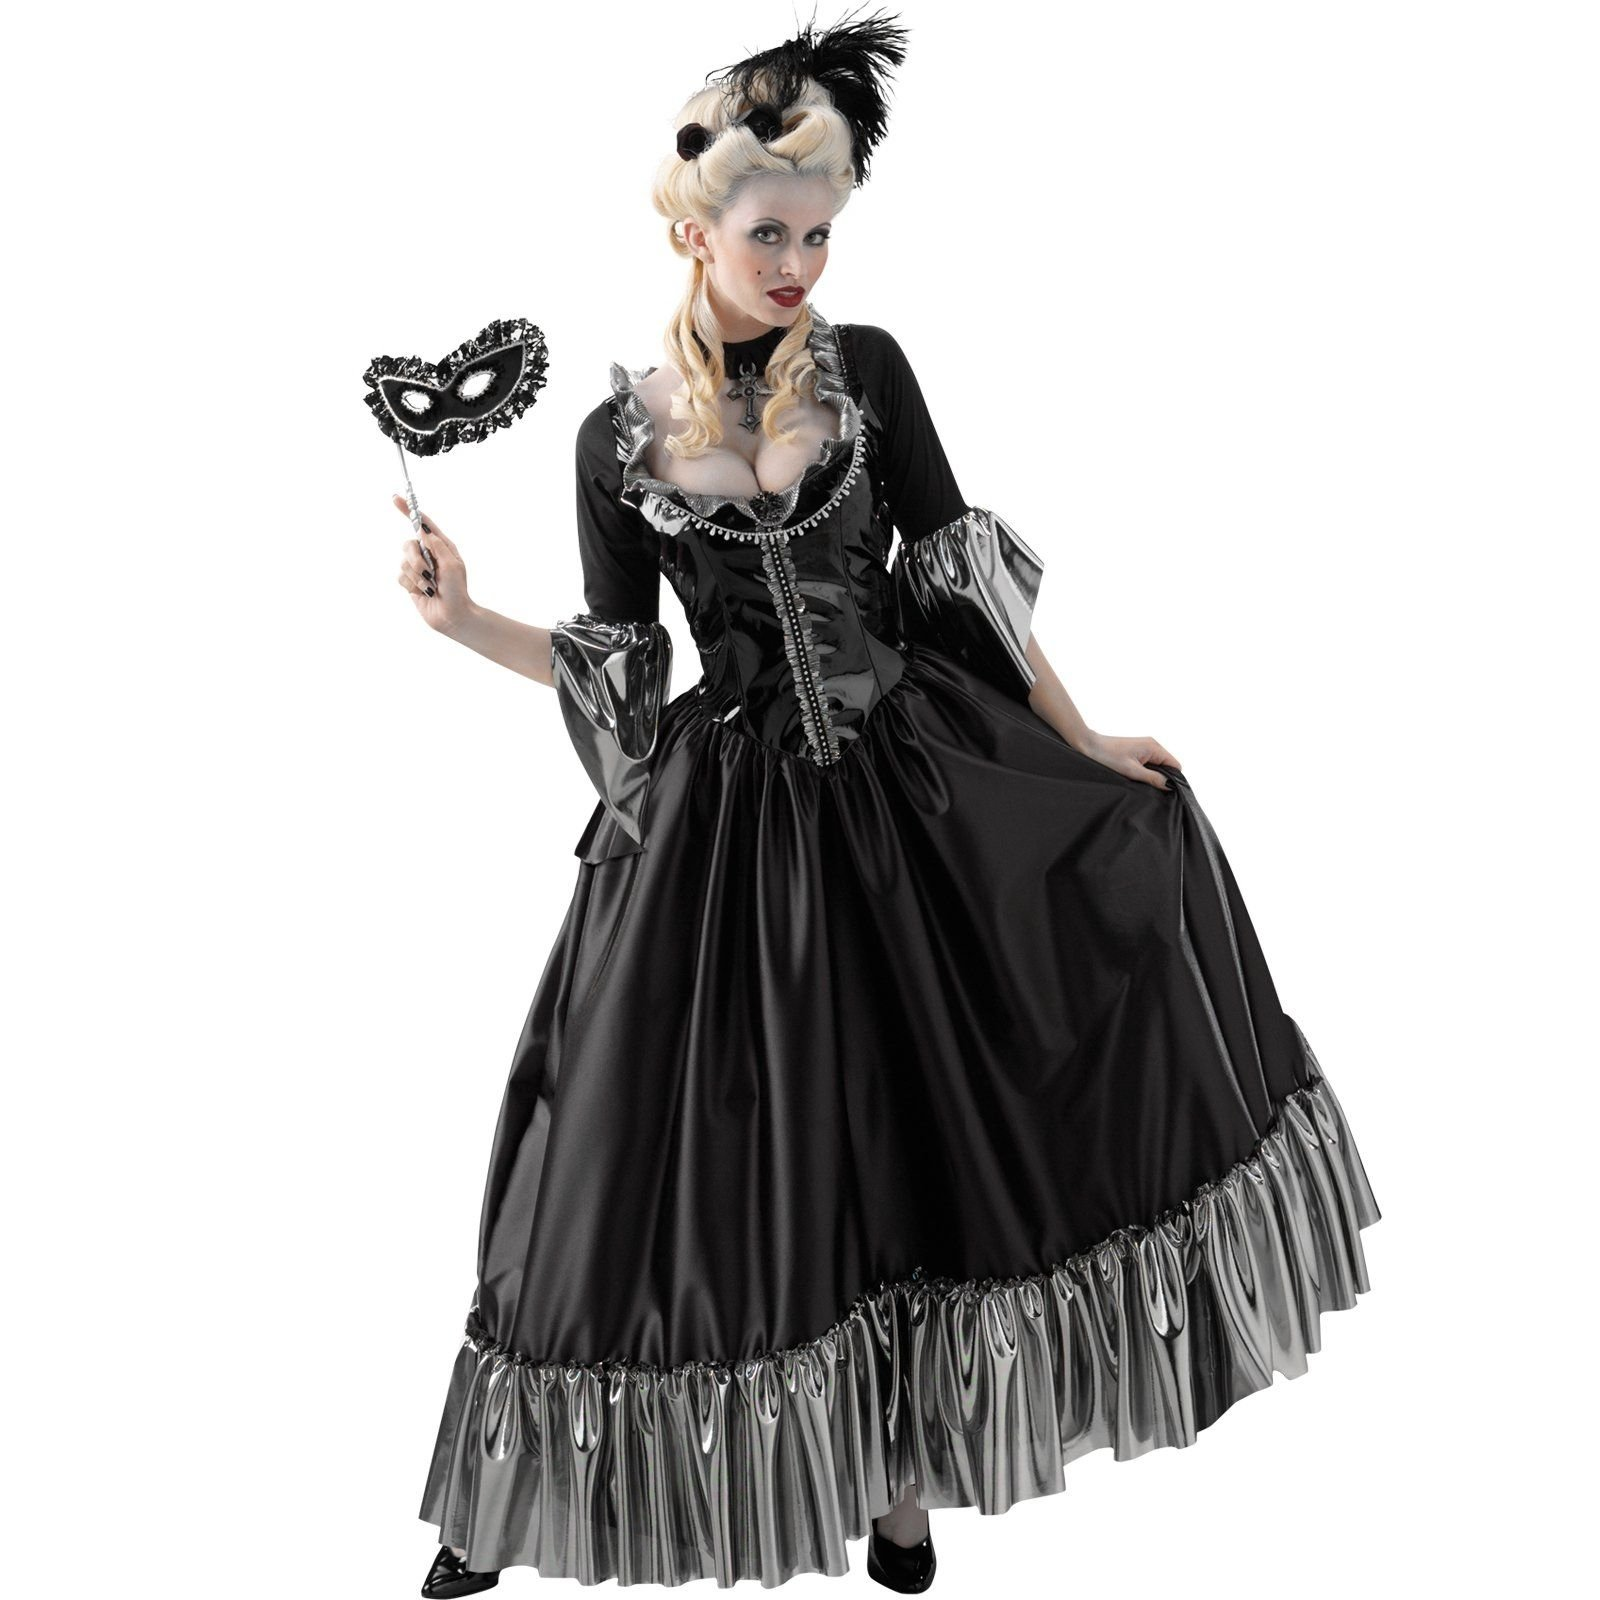 10 Lovable Masquerade Costume Ideas For Women renaissance princess womens dress costume masquerades masquerade 2021